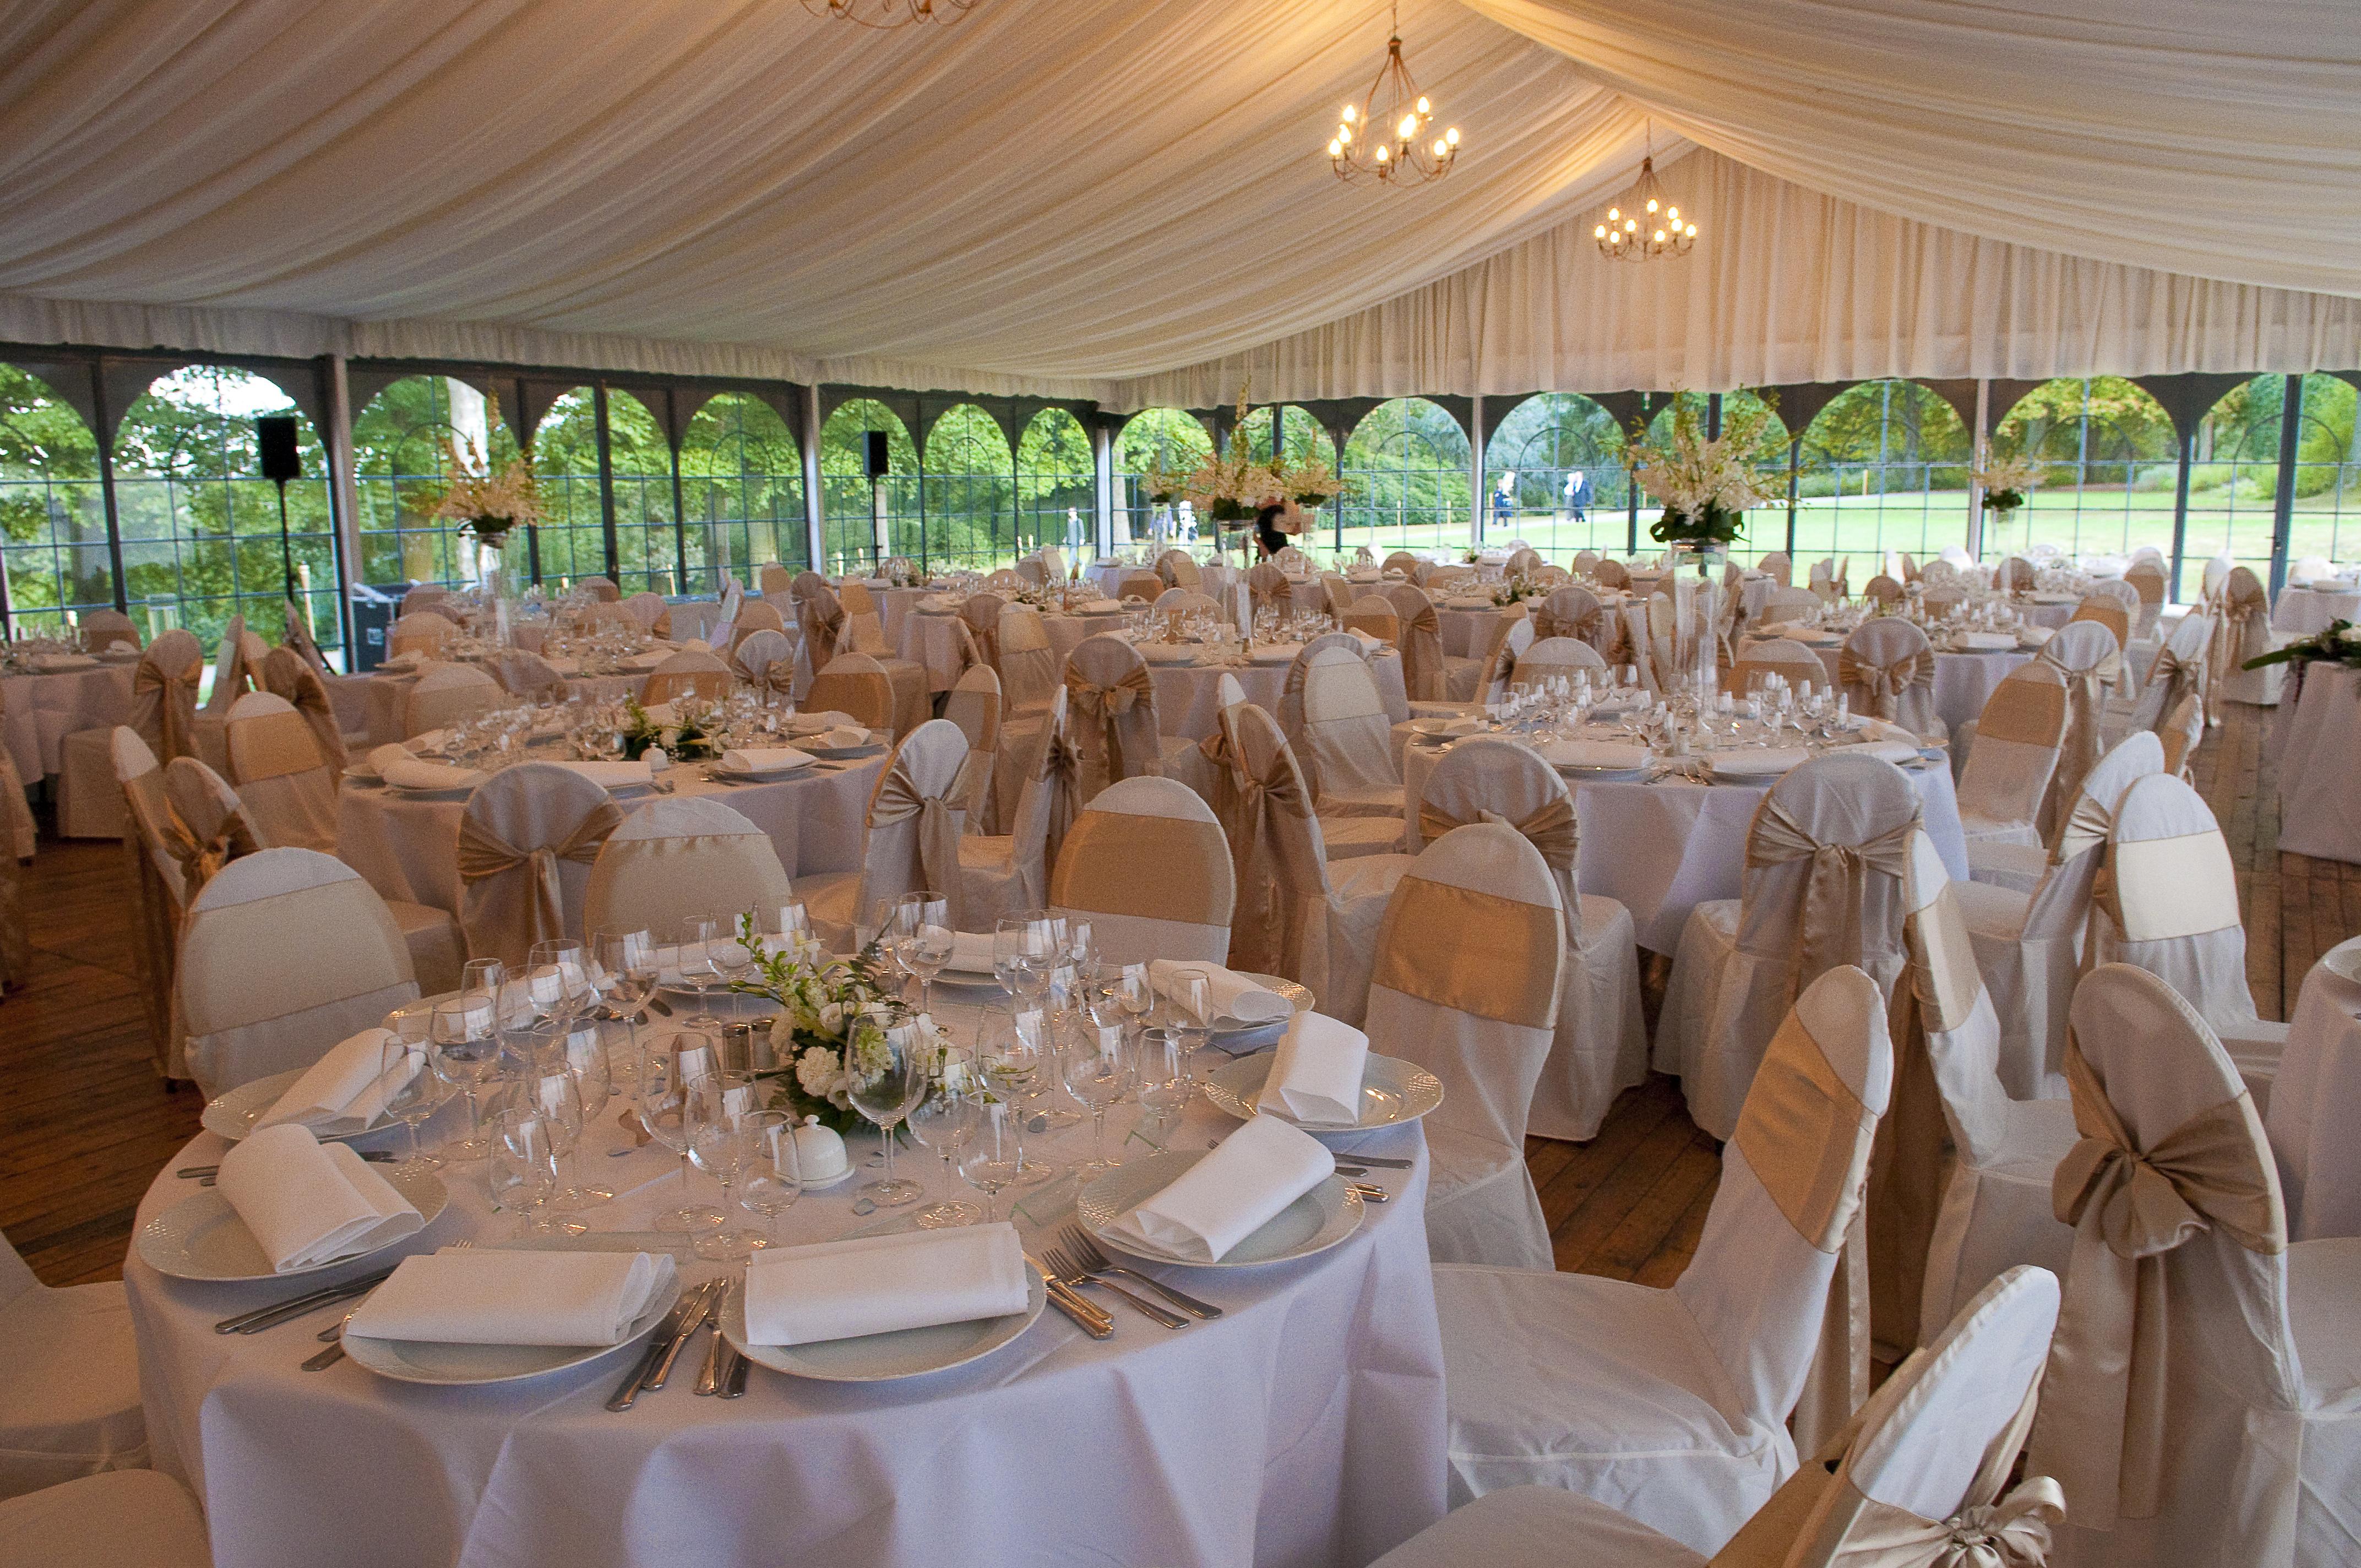 wedding planner organisateur de mariage wedding planner. Black Bedroom Furniture Sets. Home Design Ideas